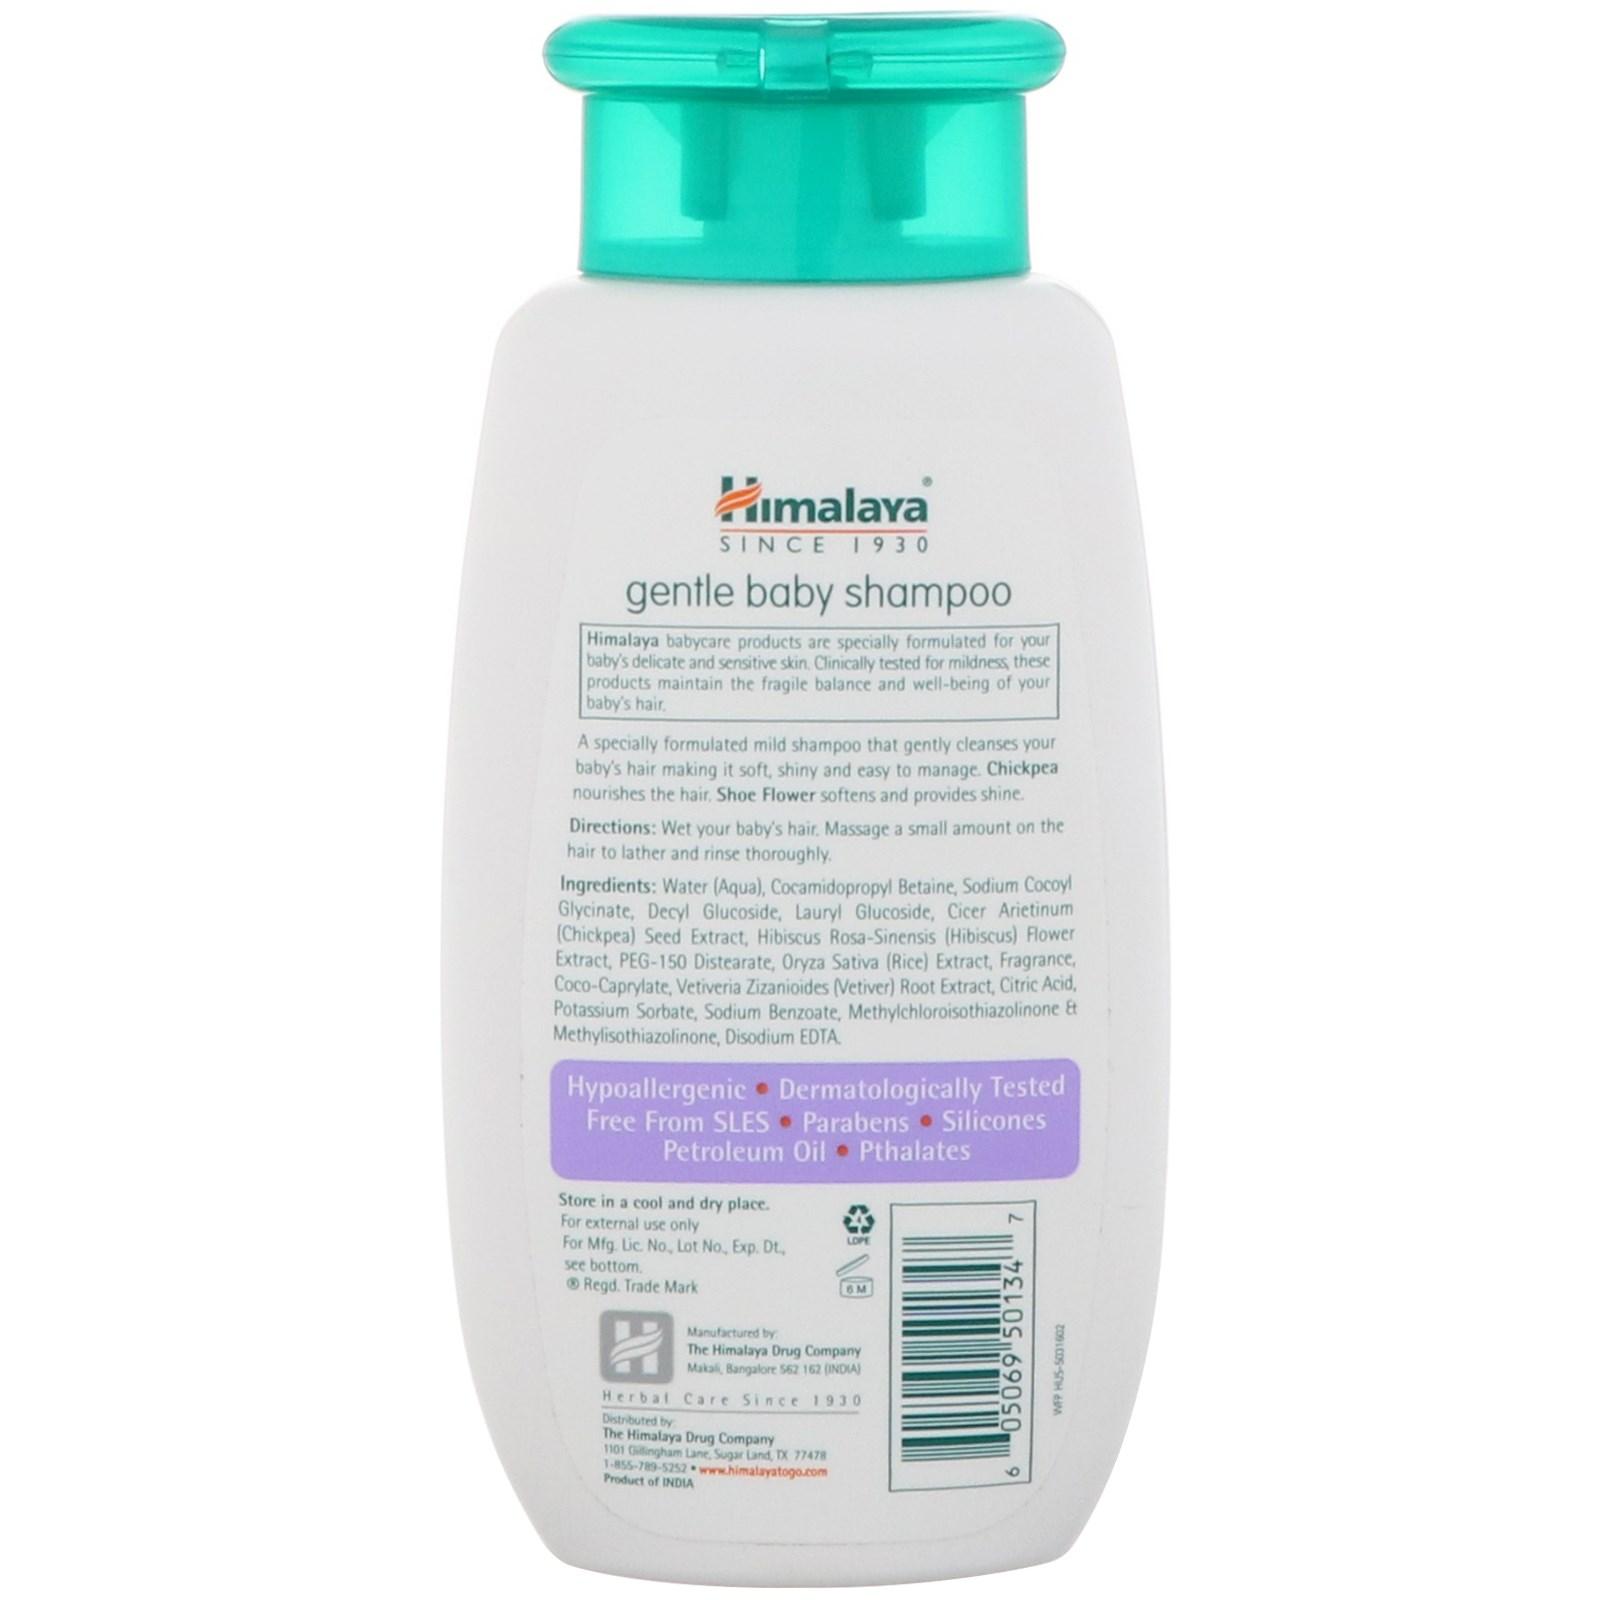 Himalaya, Gentle Baby Shampoo, 3 38 fl oz (100 ml)